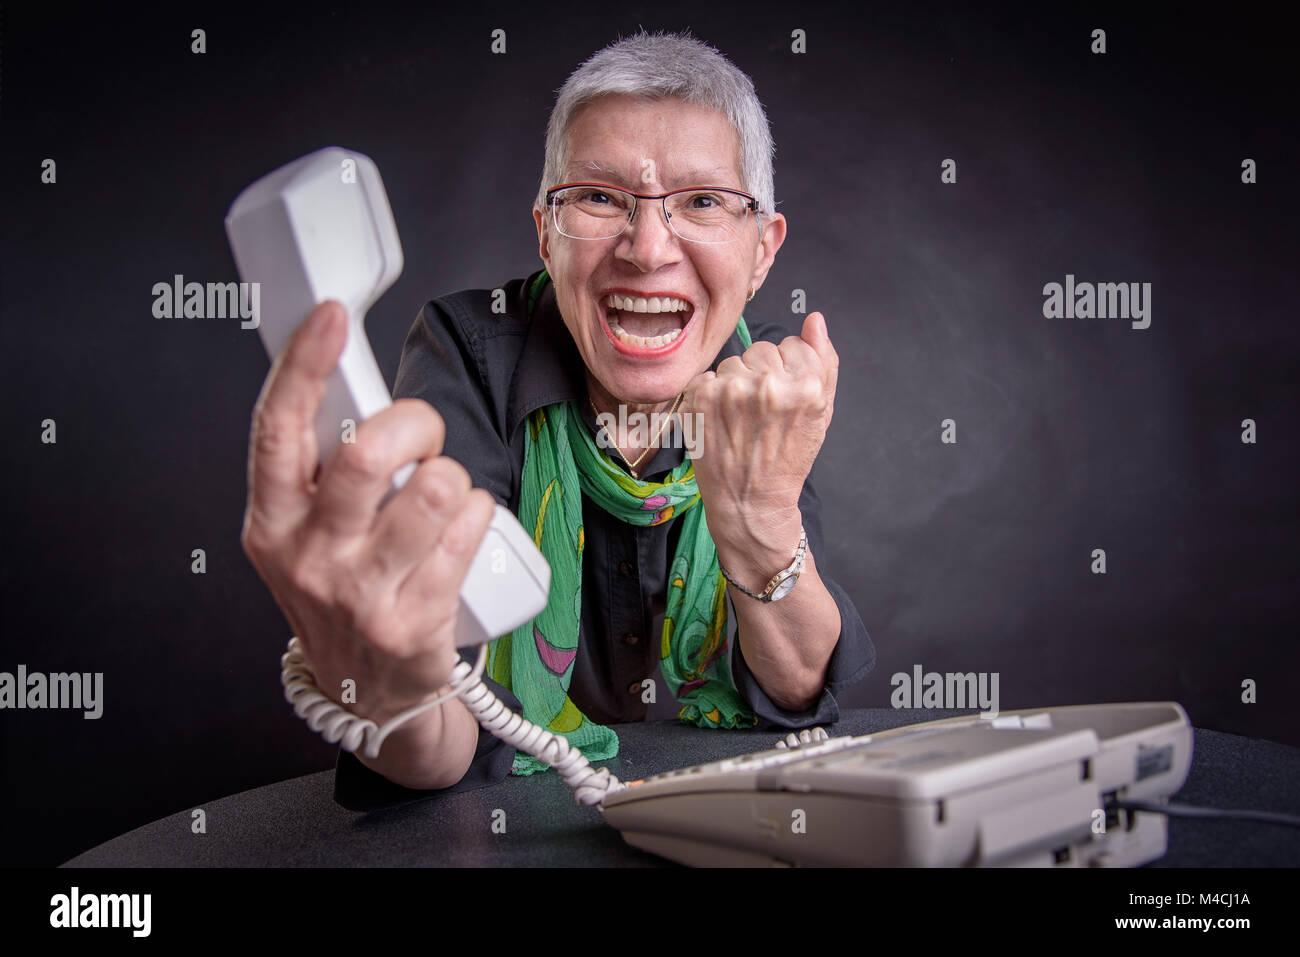 Terrible service, angry senior woman yelling at phone - Stock Image